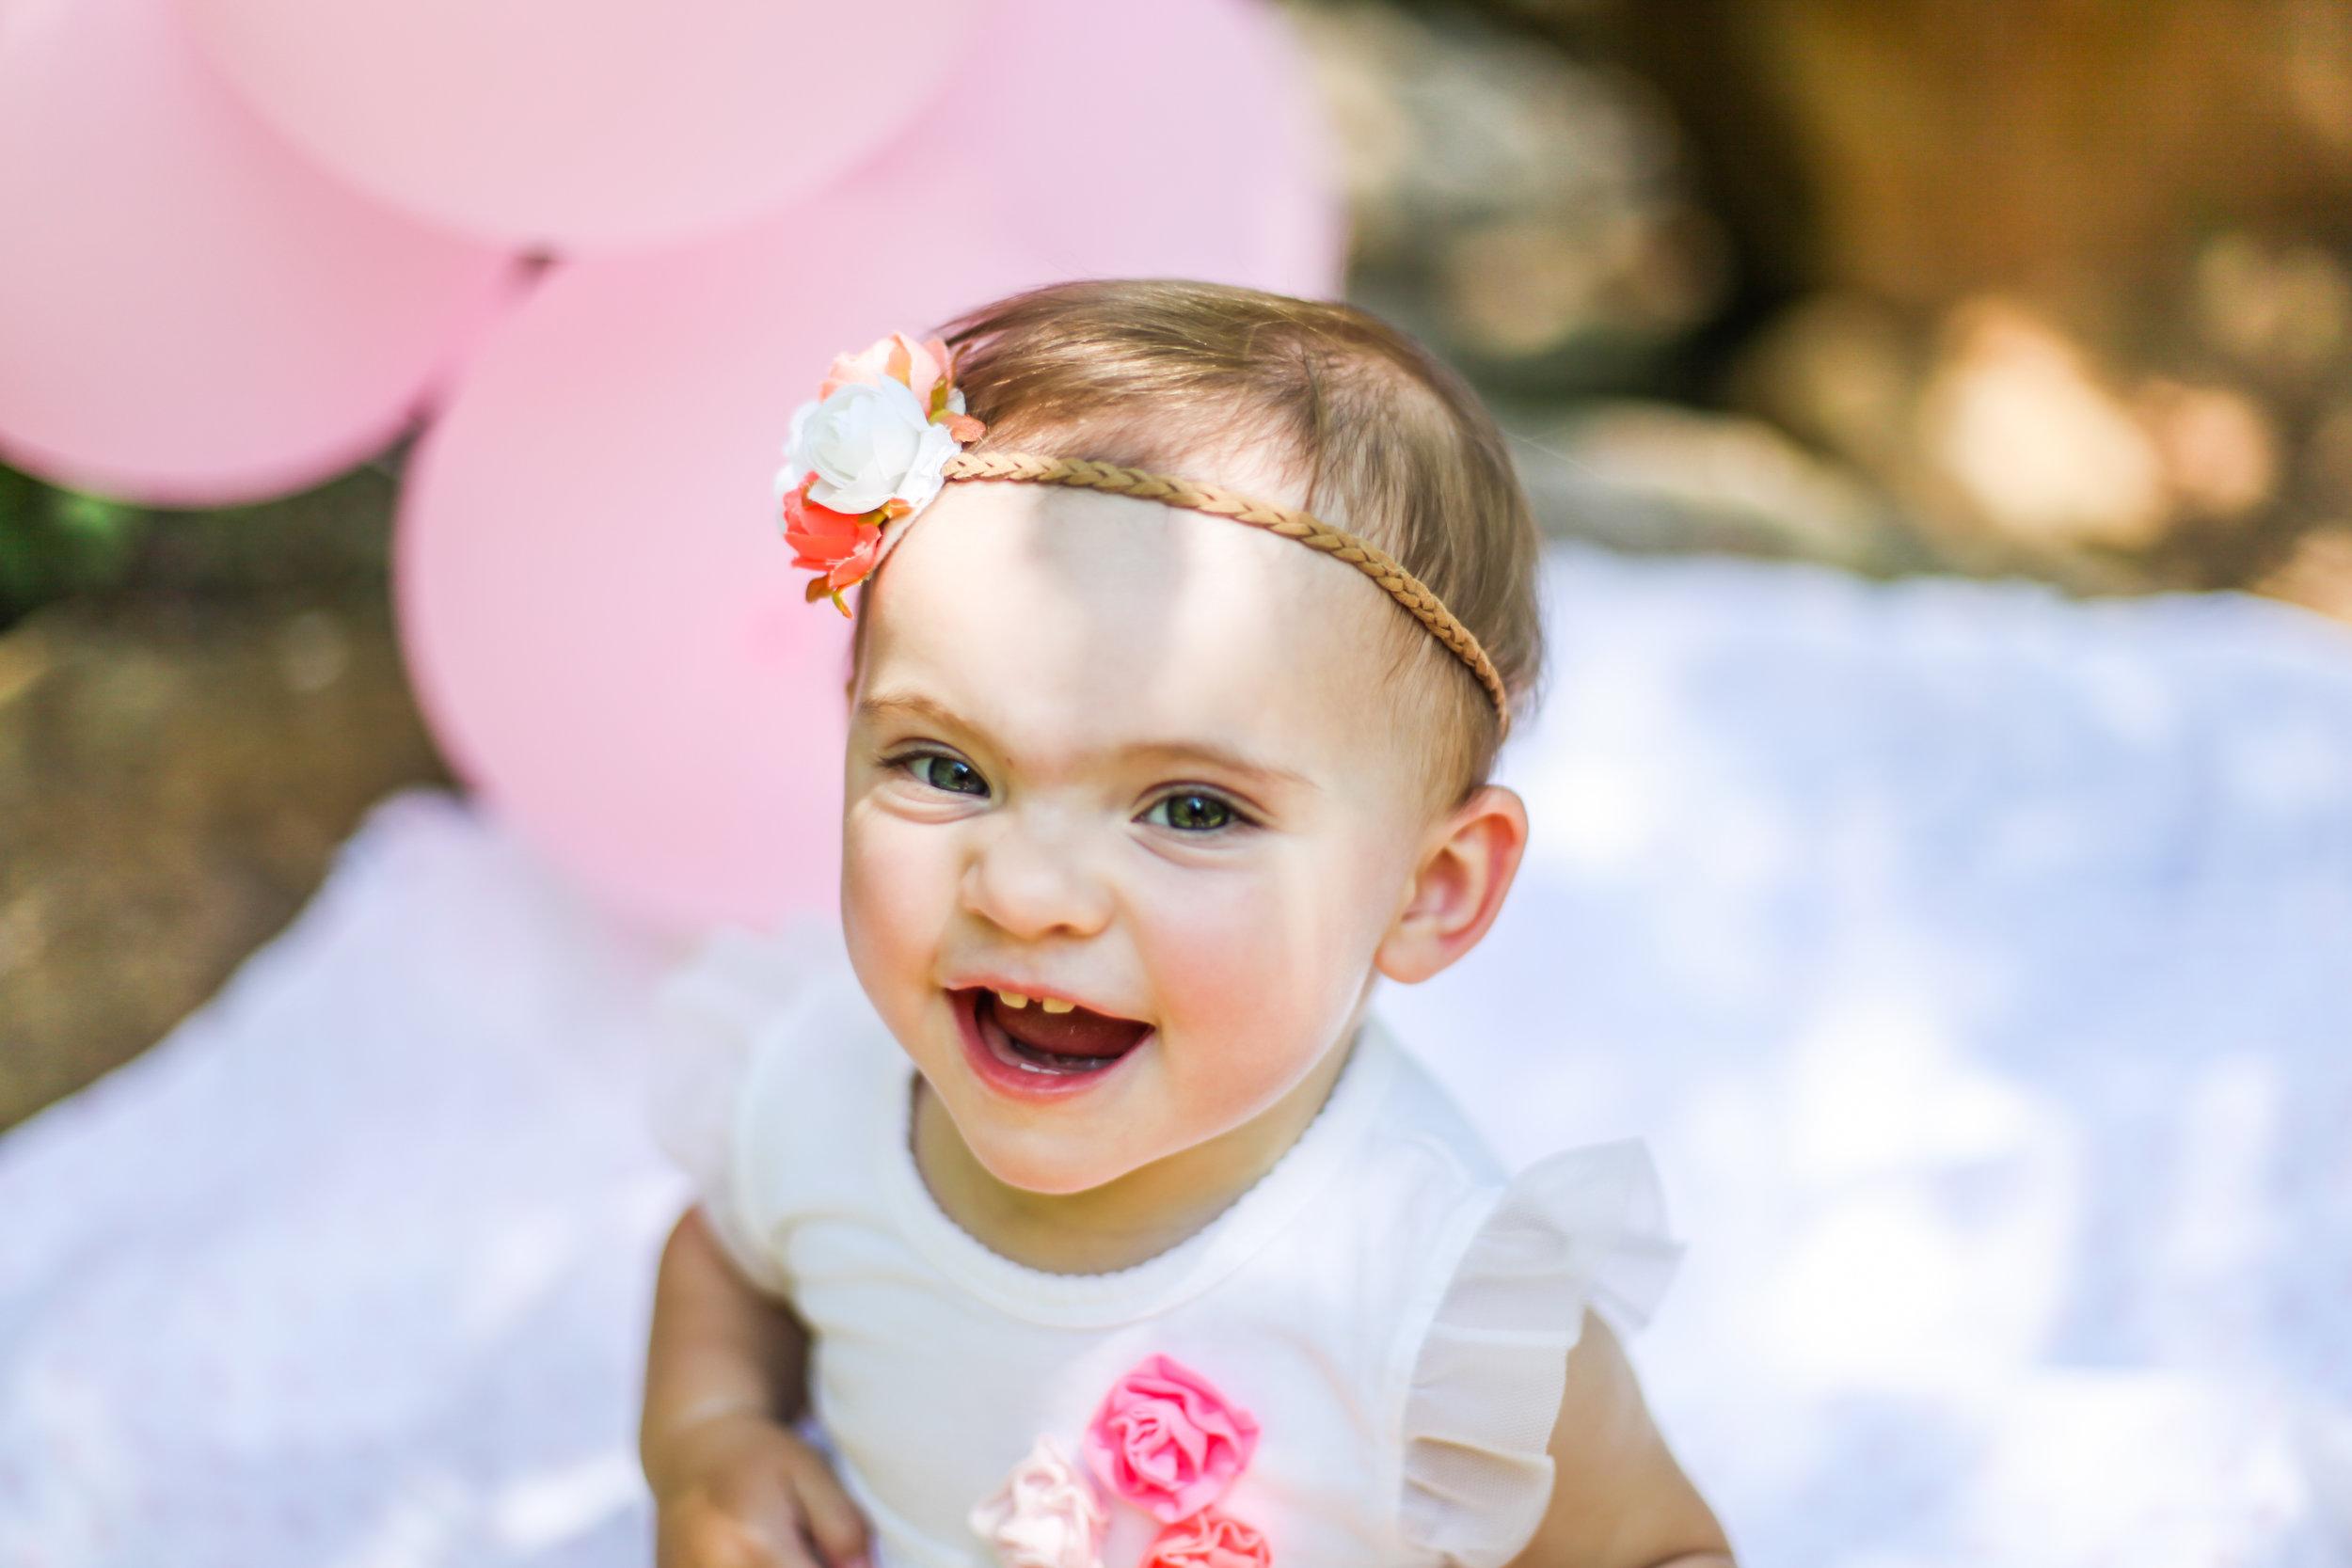 woodstock baby photography angela elliott-79.jpg